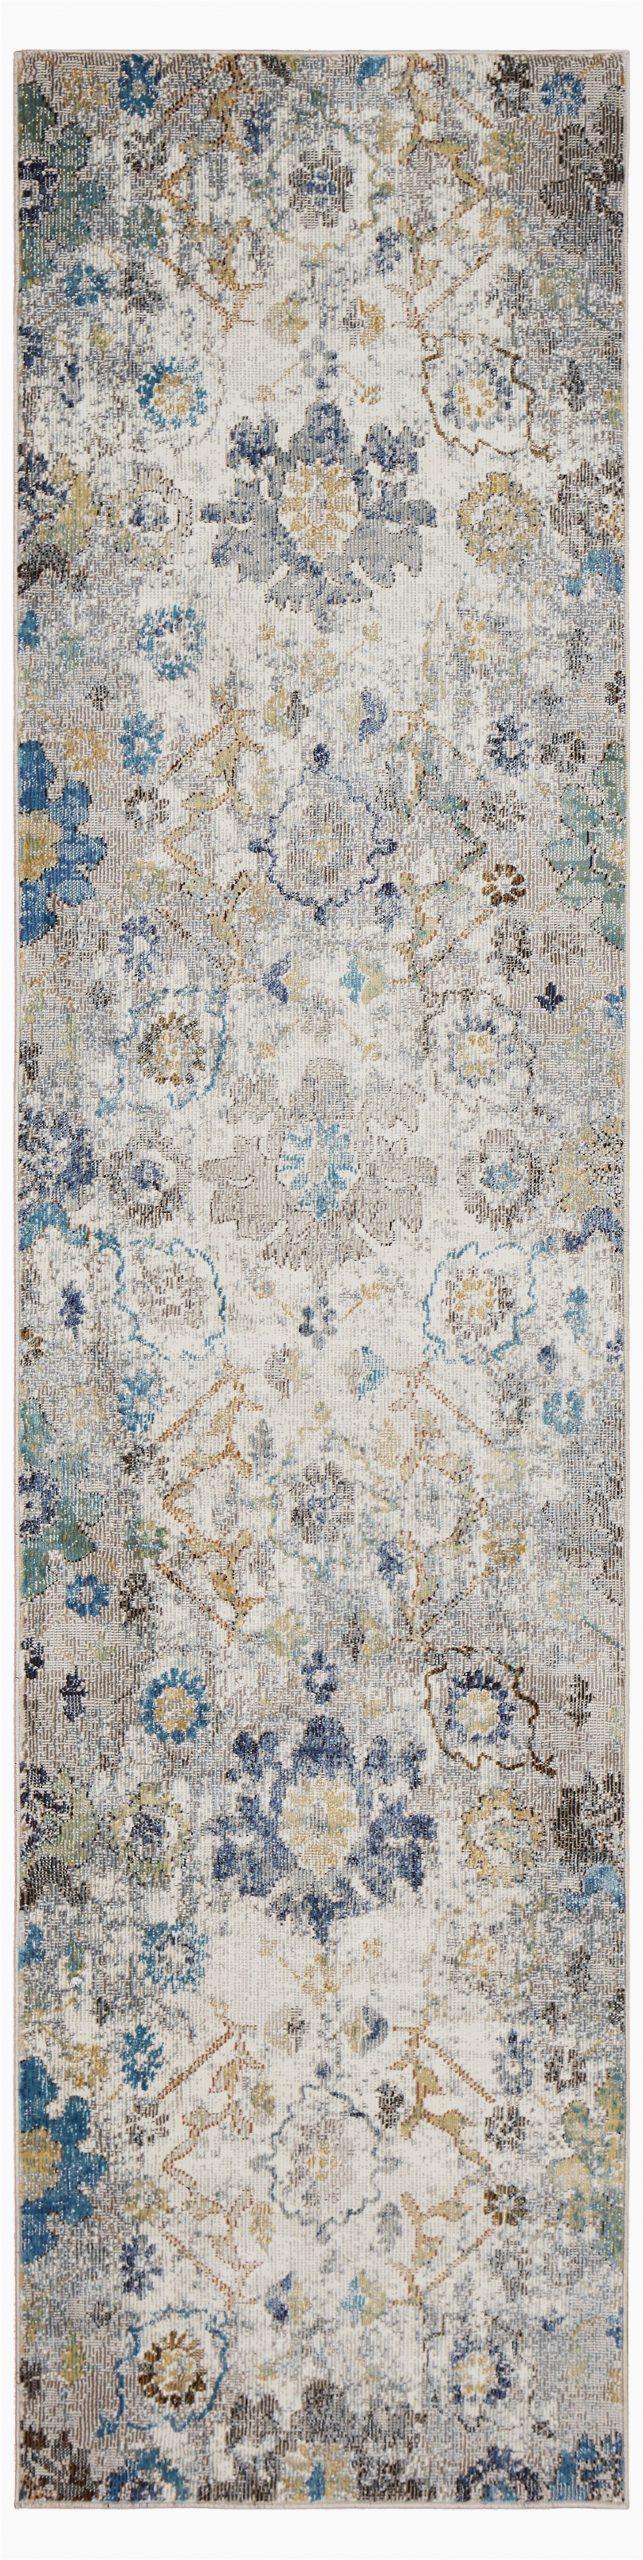 amory floral creamgrayblue area rug